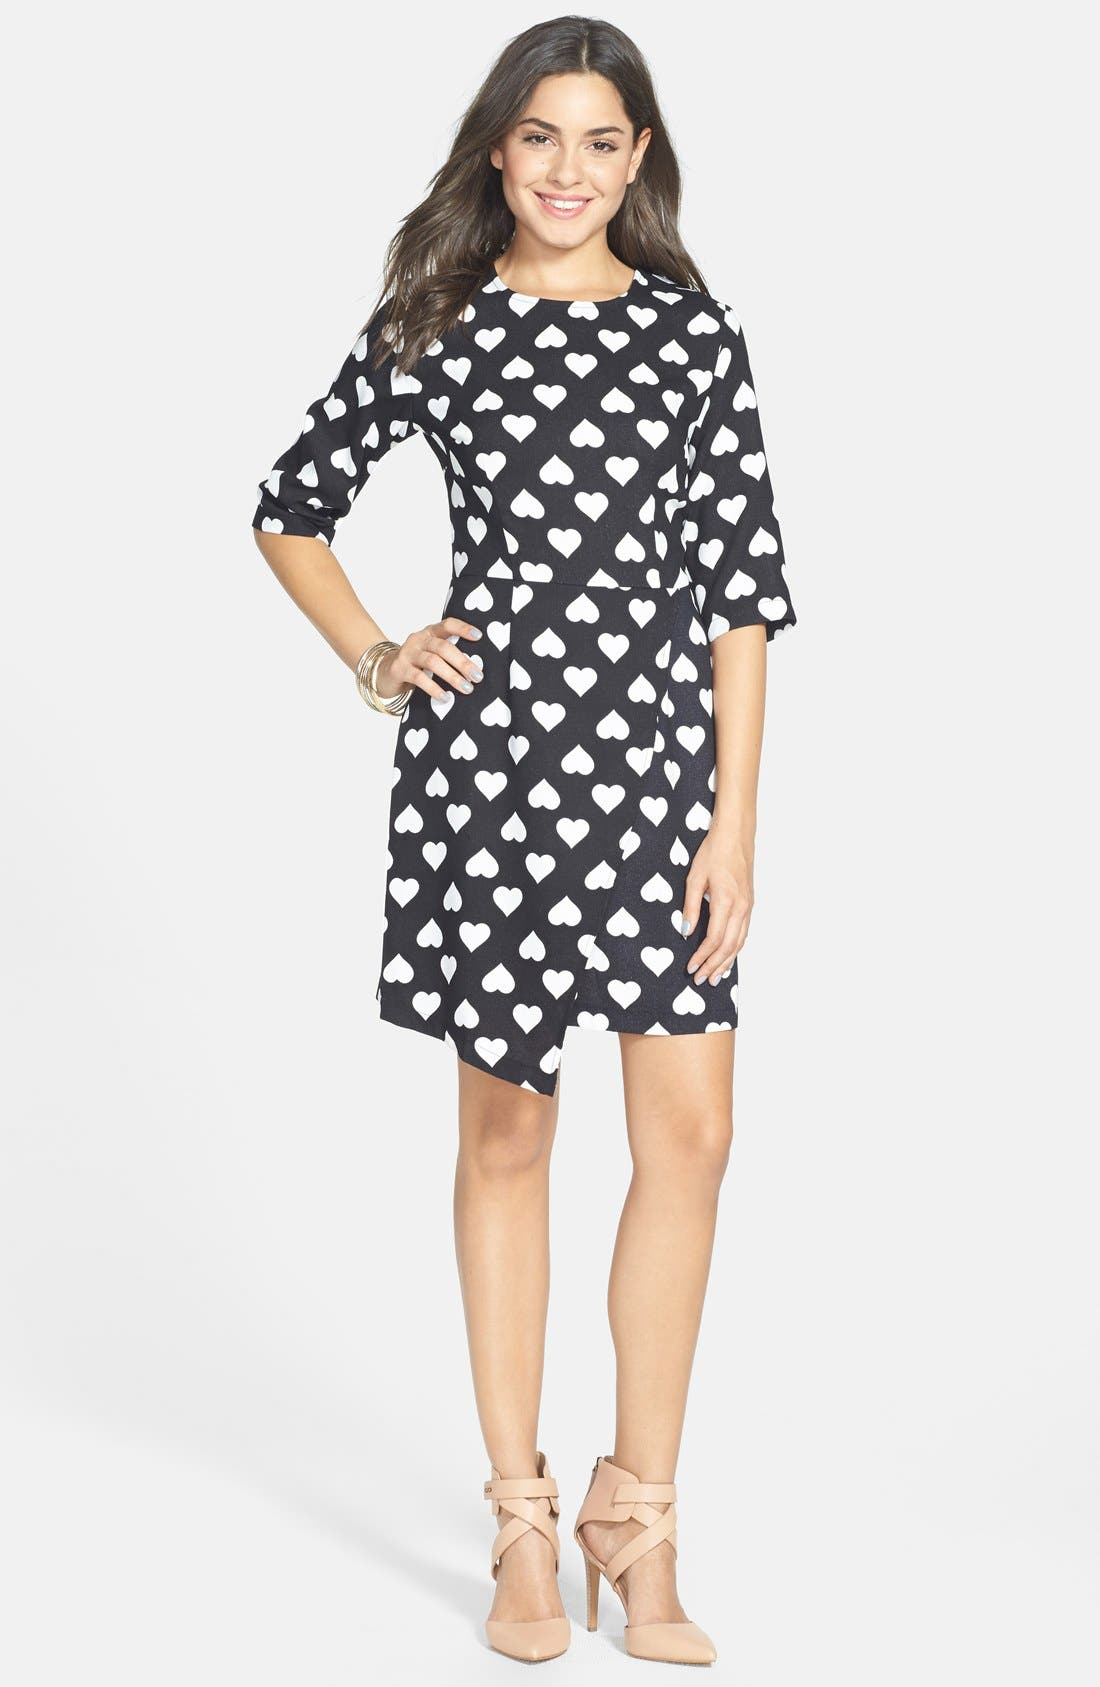 POPPY LUX 'Nancy' Heart Print Asymmetrical Dress, Main, color, 001